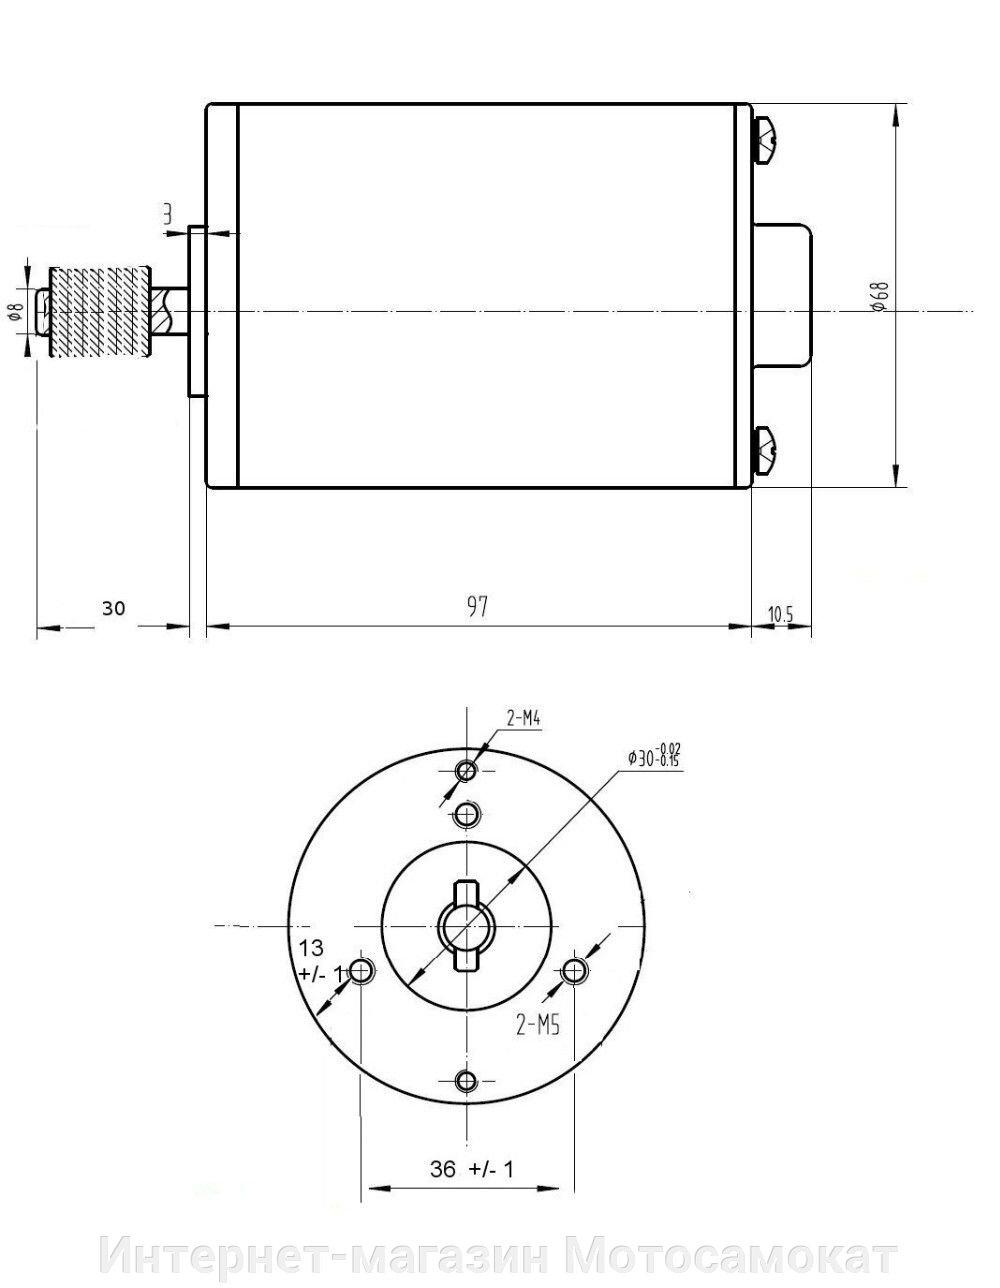 Электро двигатель MY6812 для электросамоката, 24 вольта 120 ватт - фото Размеры электромотора MY6812